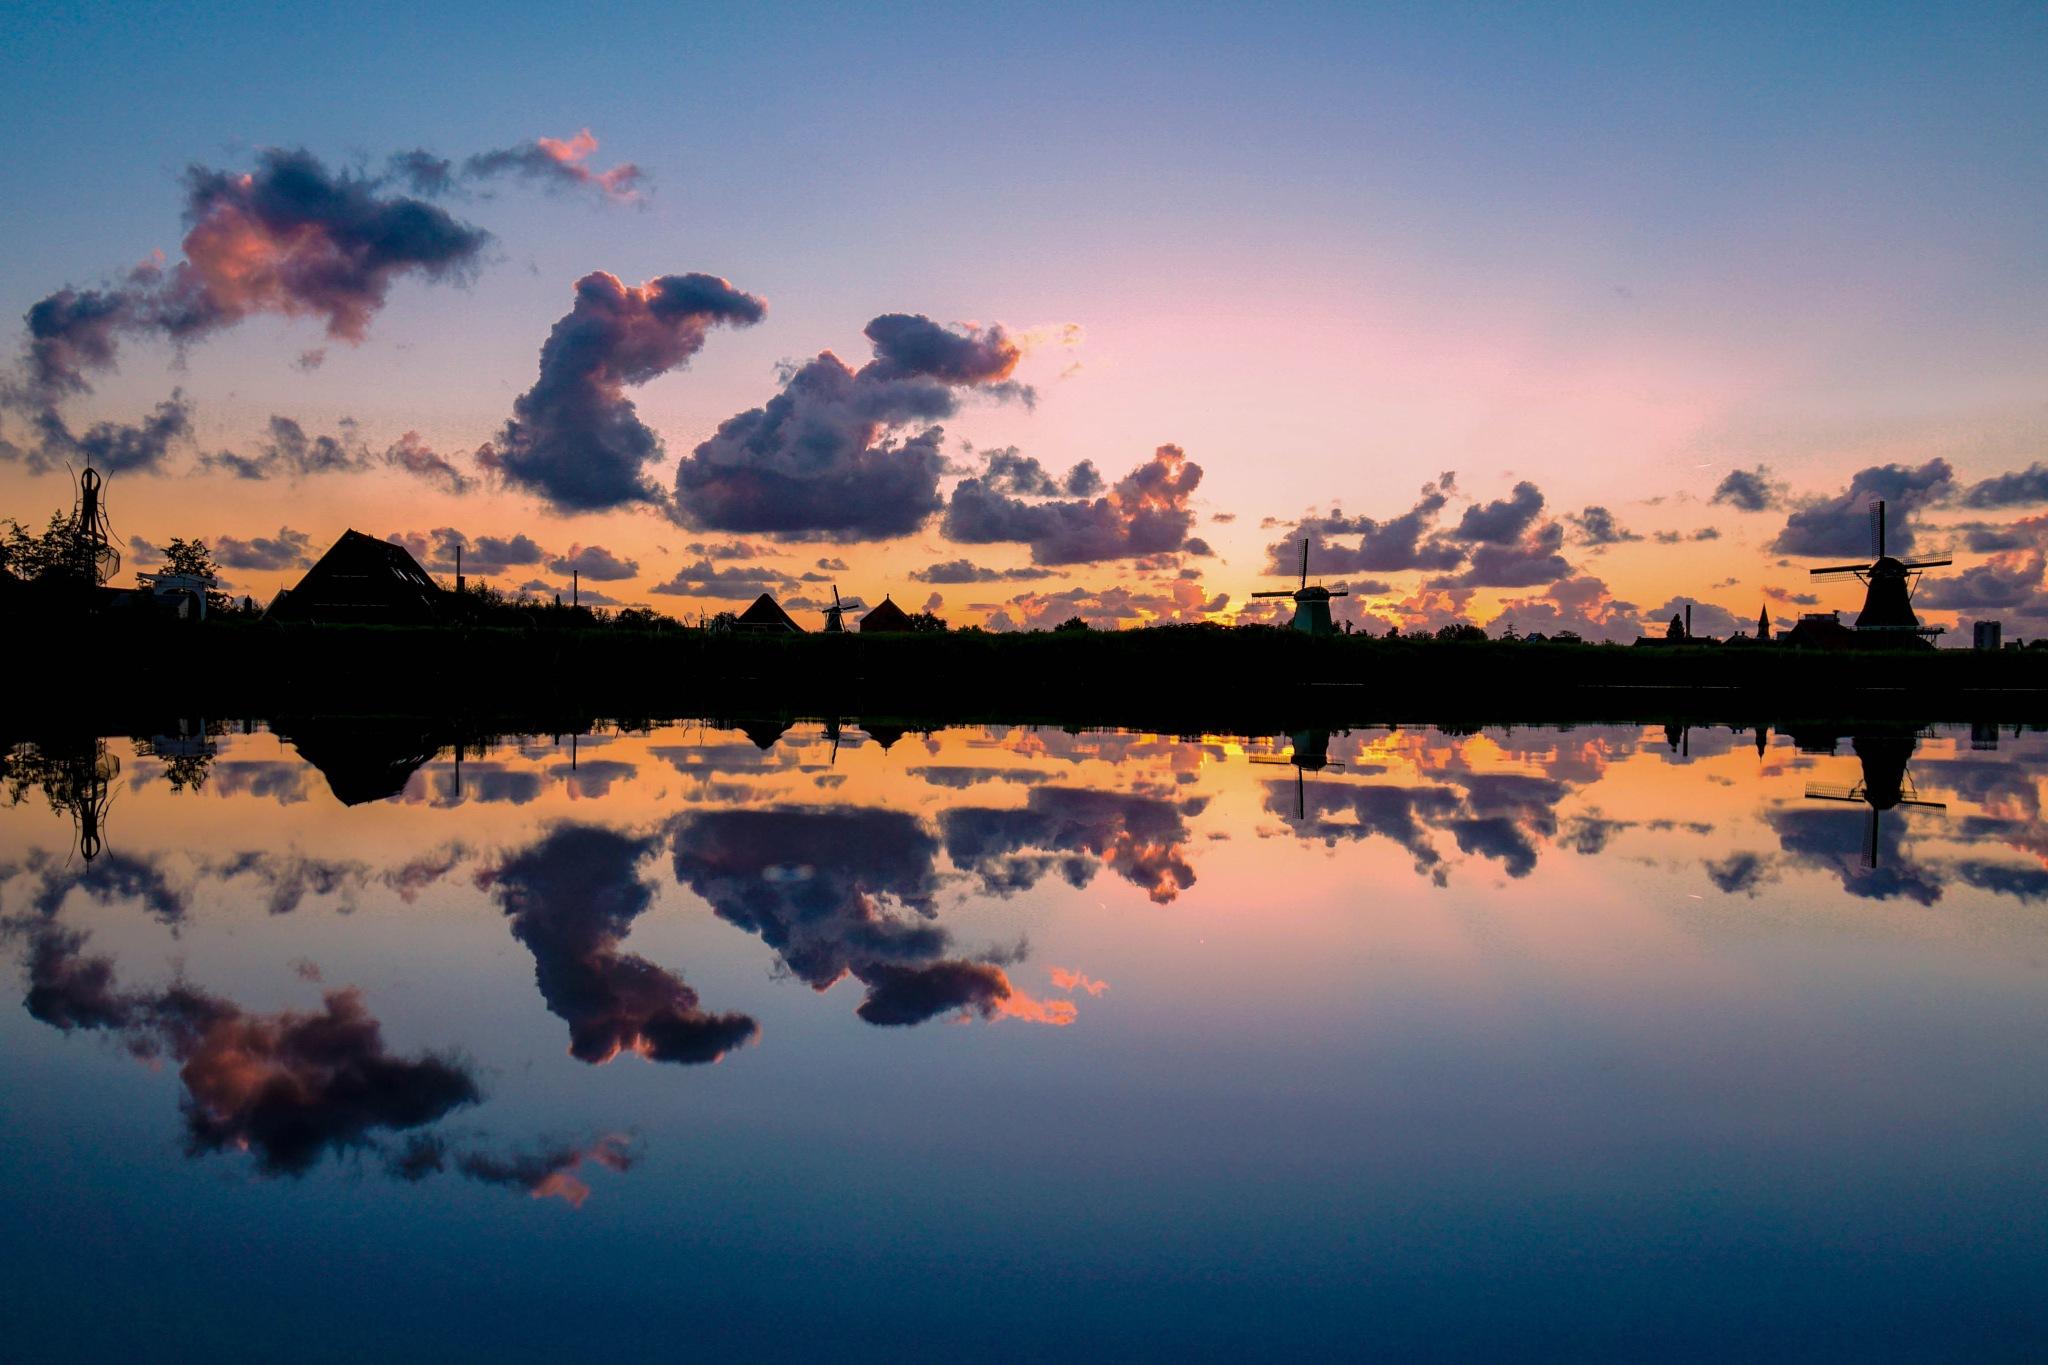 Zaanse clouds by Shaggynum